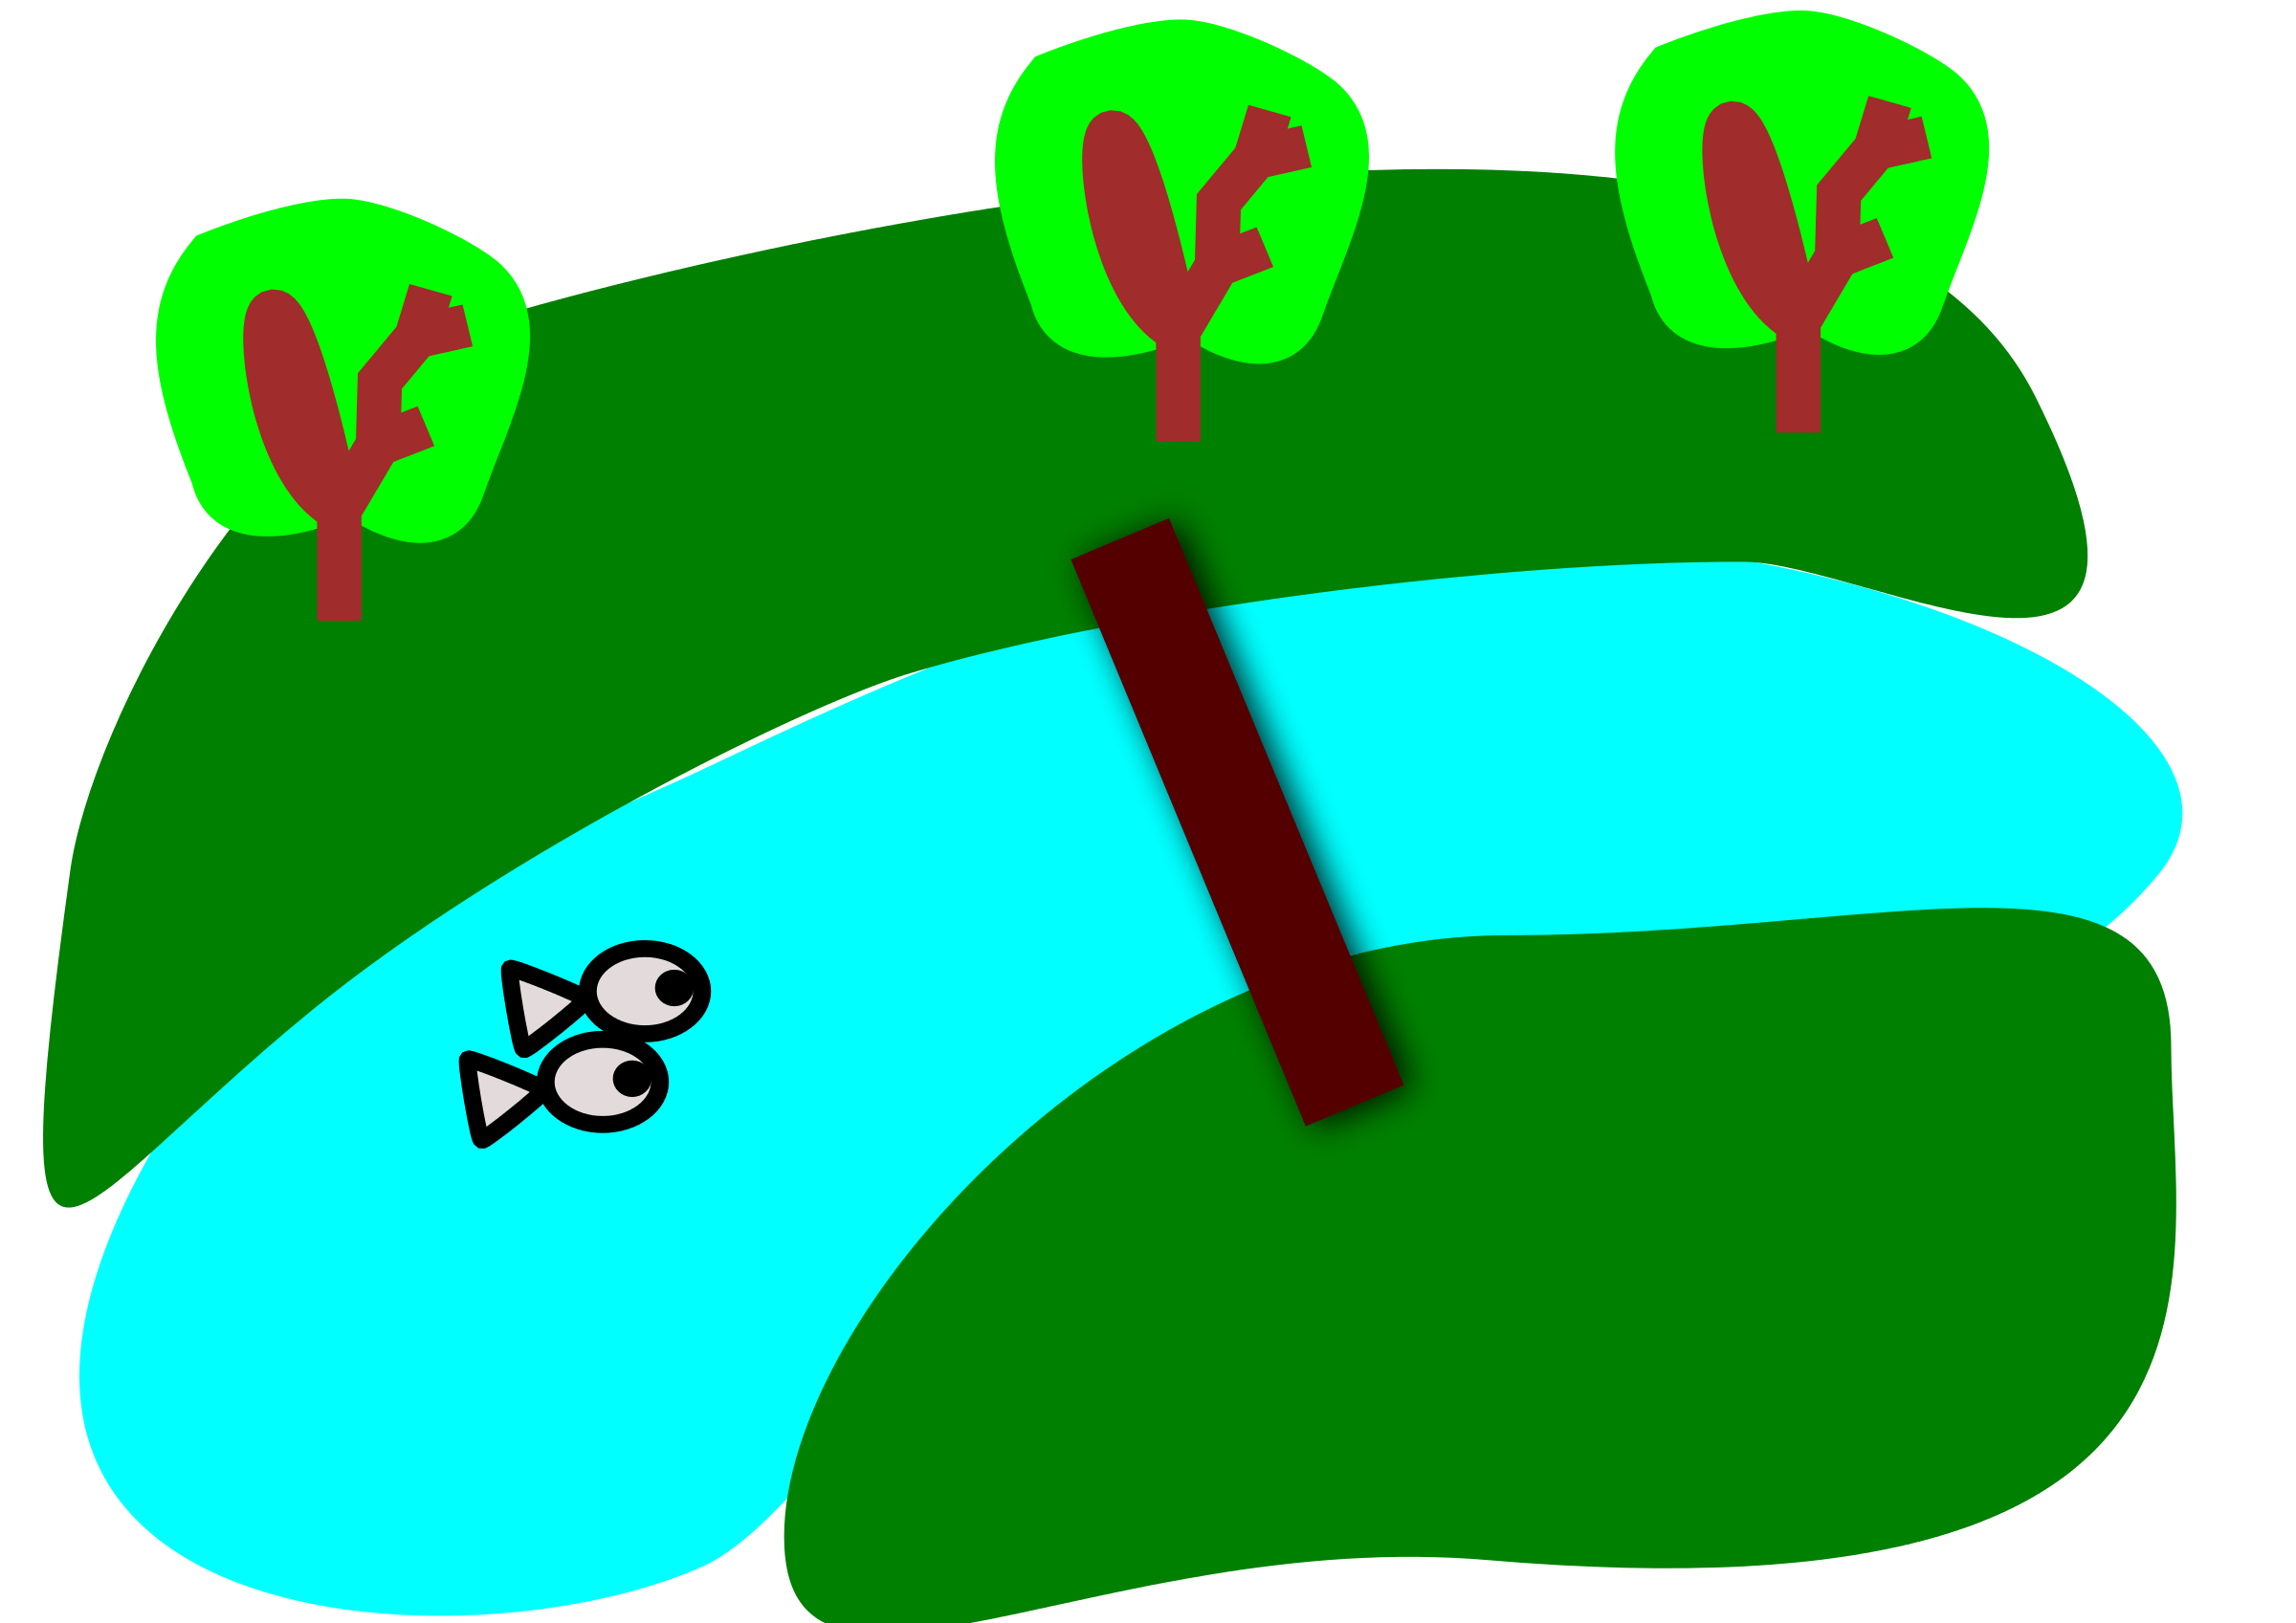 Clipart River.